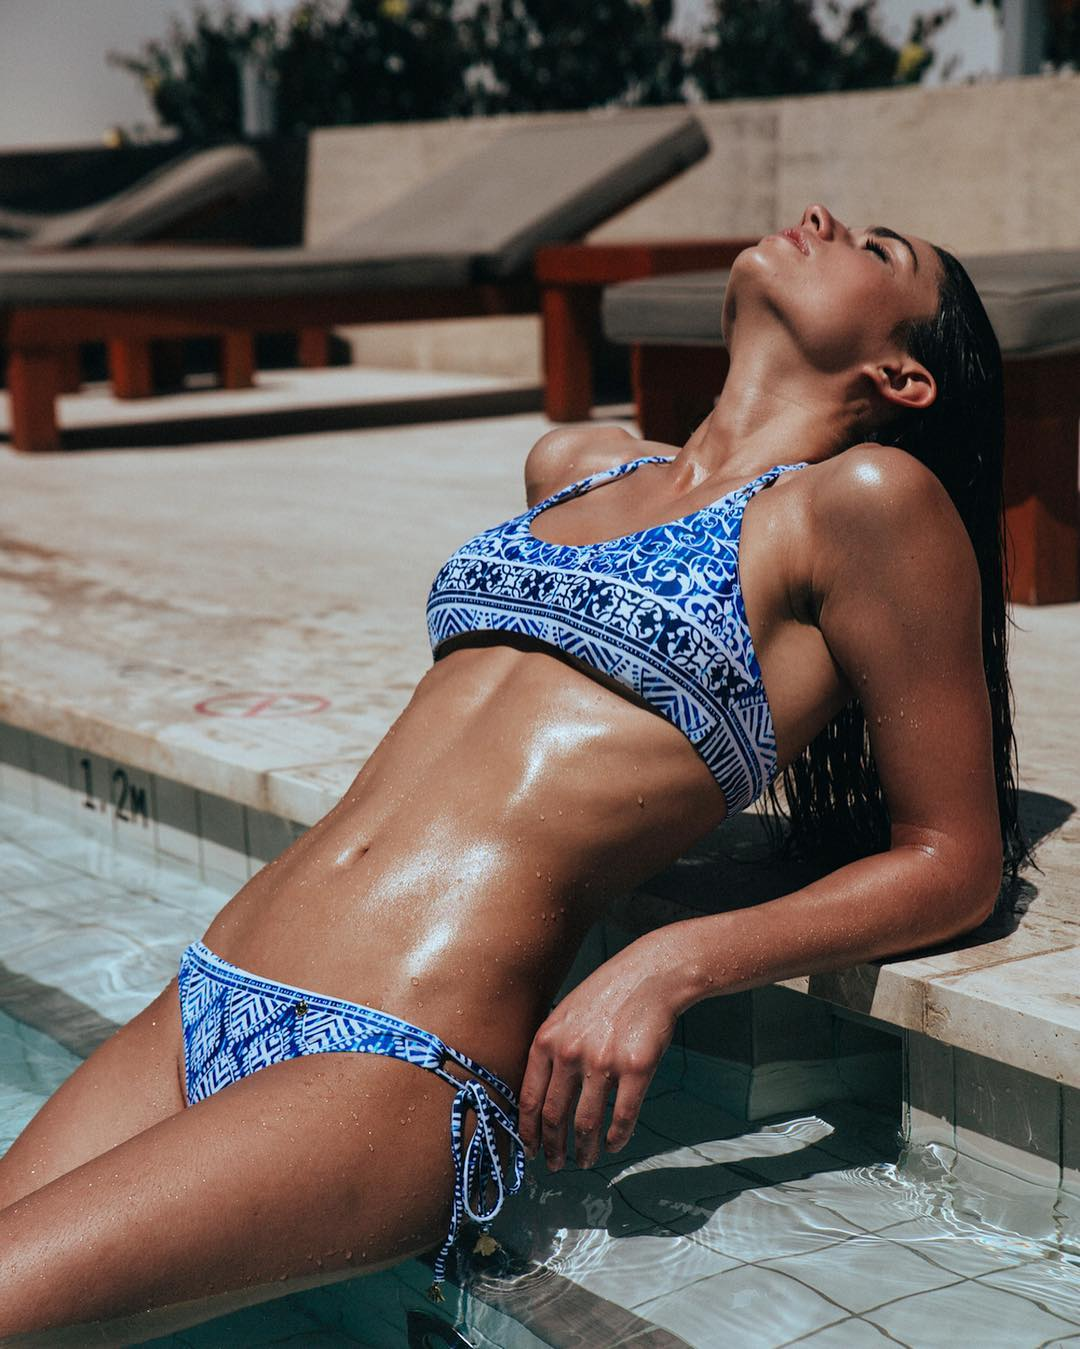 Николь Харрисон в бикини у бассейна